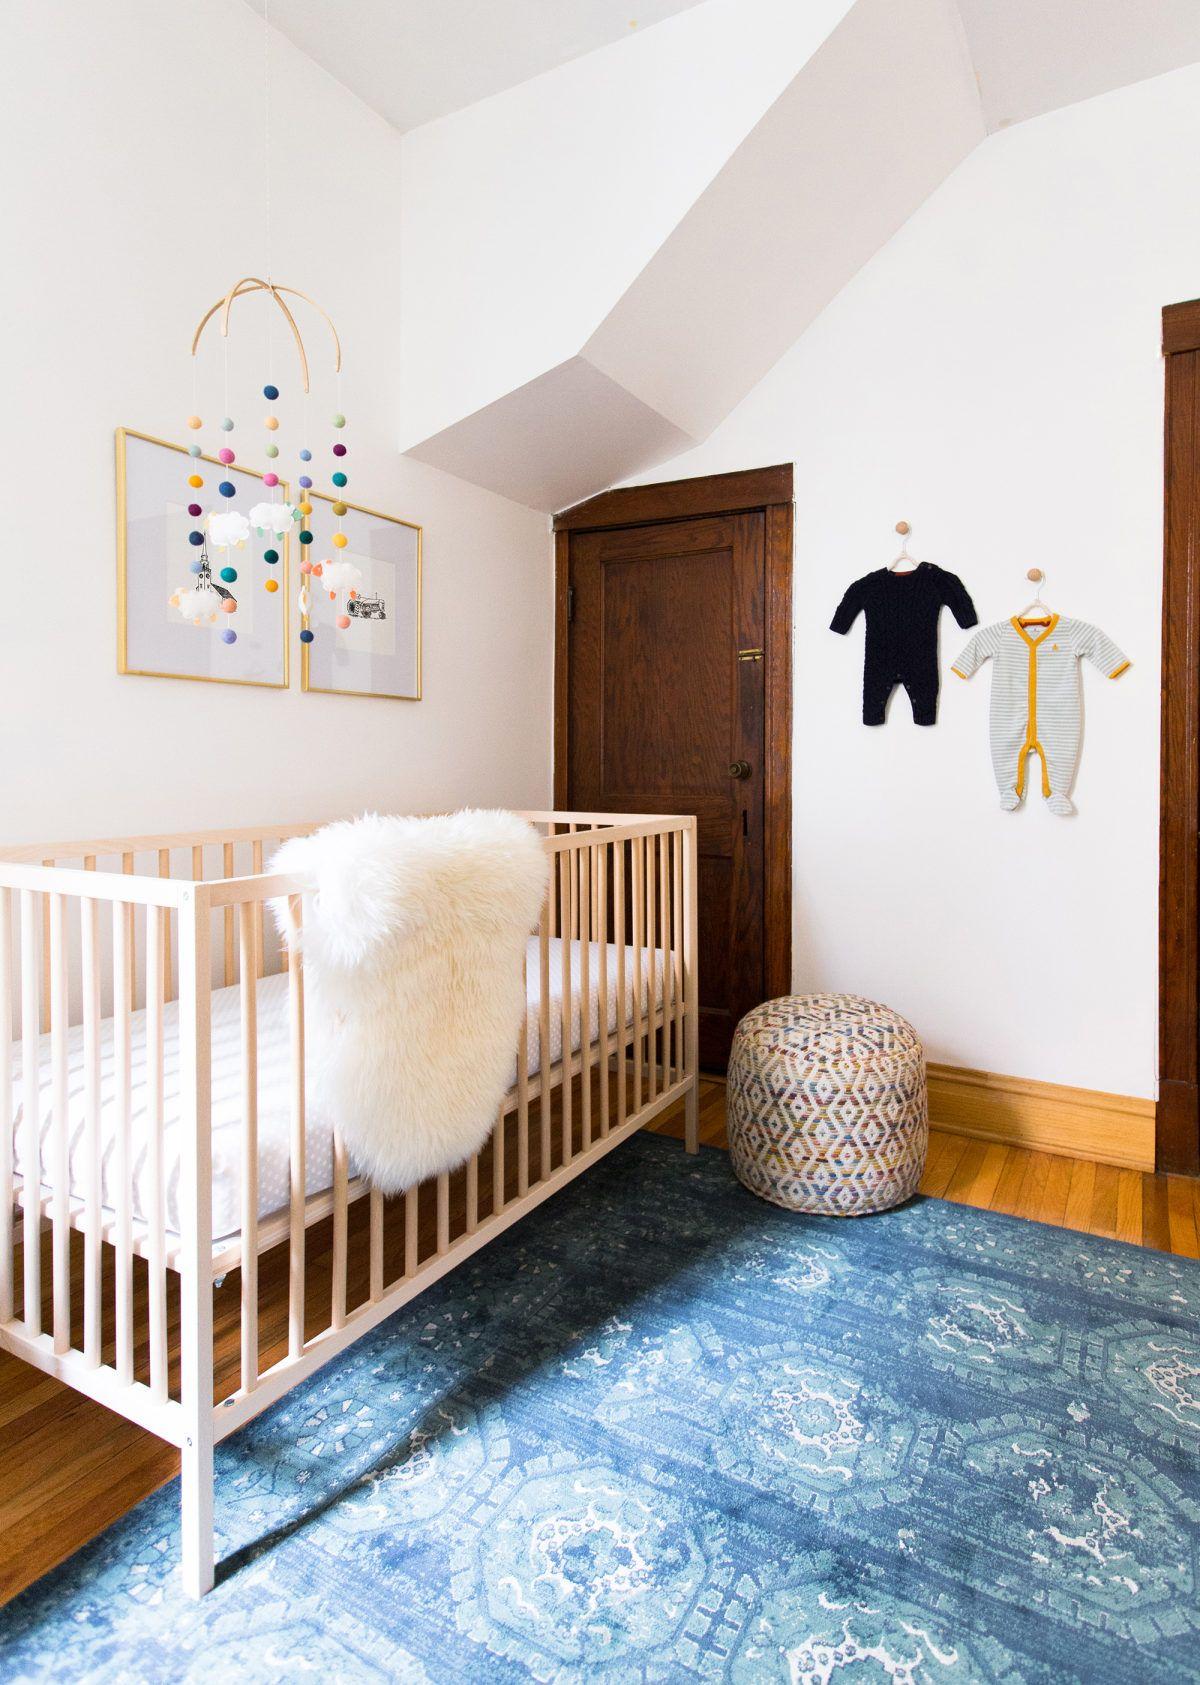 Don't hide it away - Interior Design Trends 2020